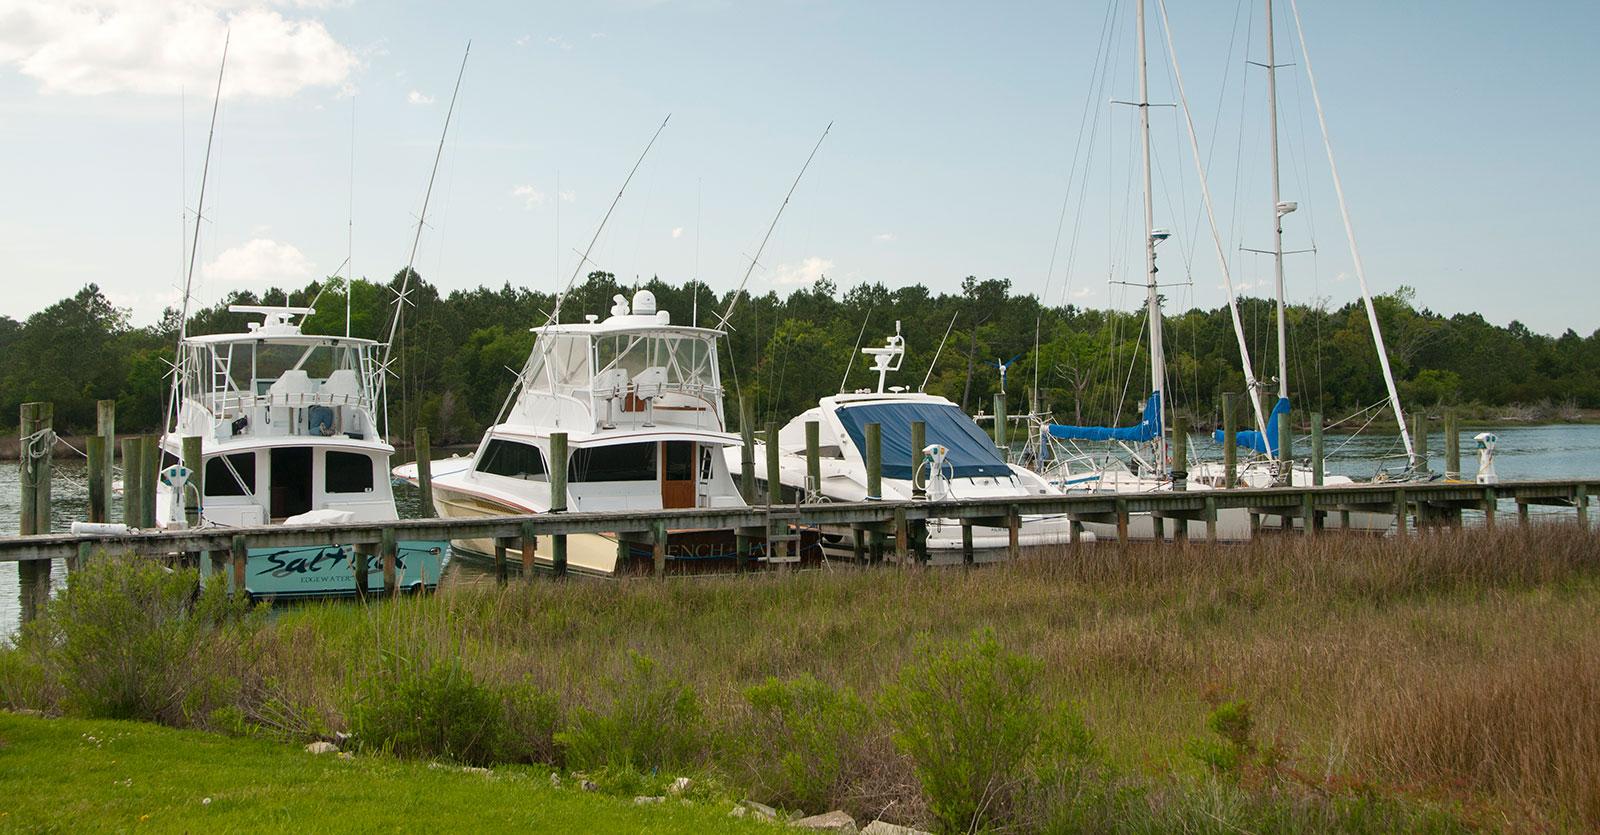 Jarrett Bay Boatworks in Beaufort, NC